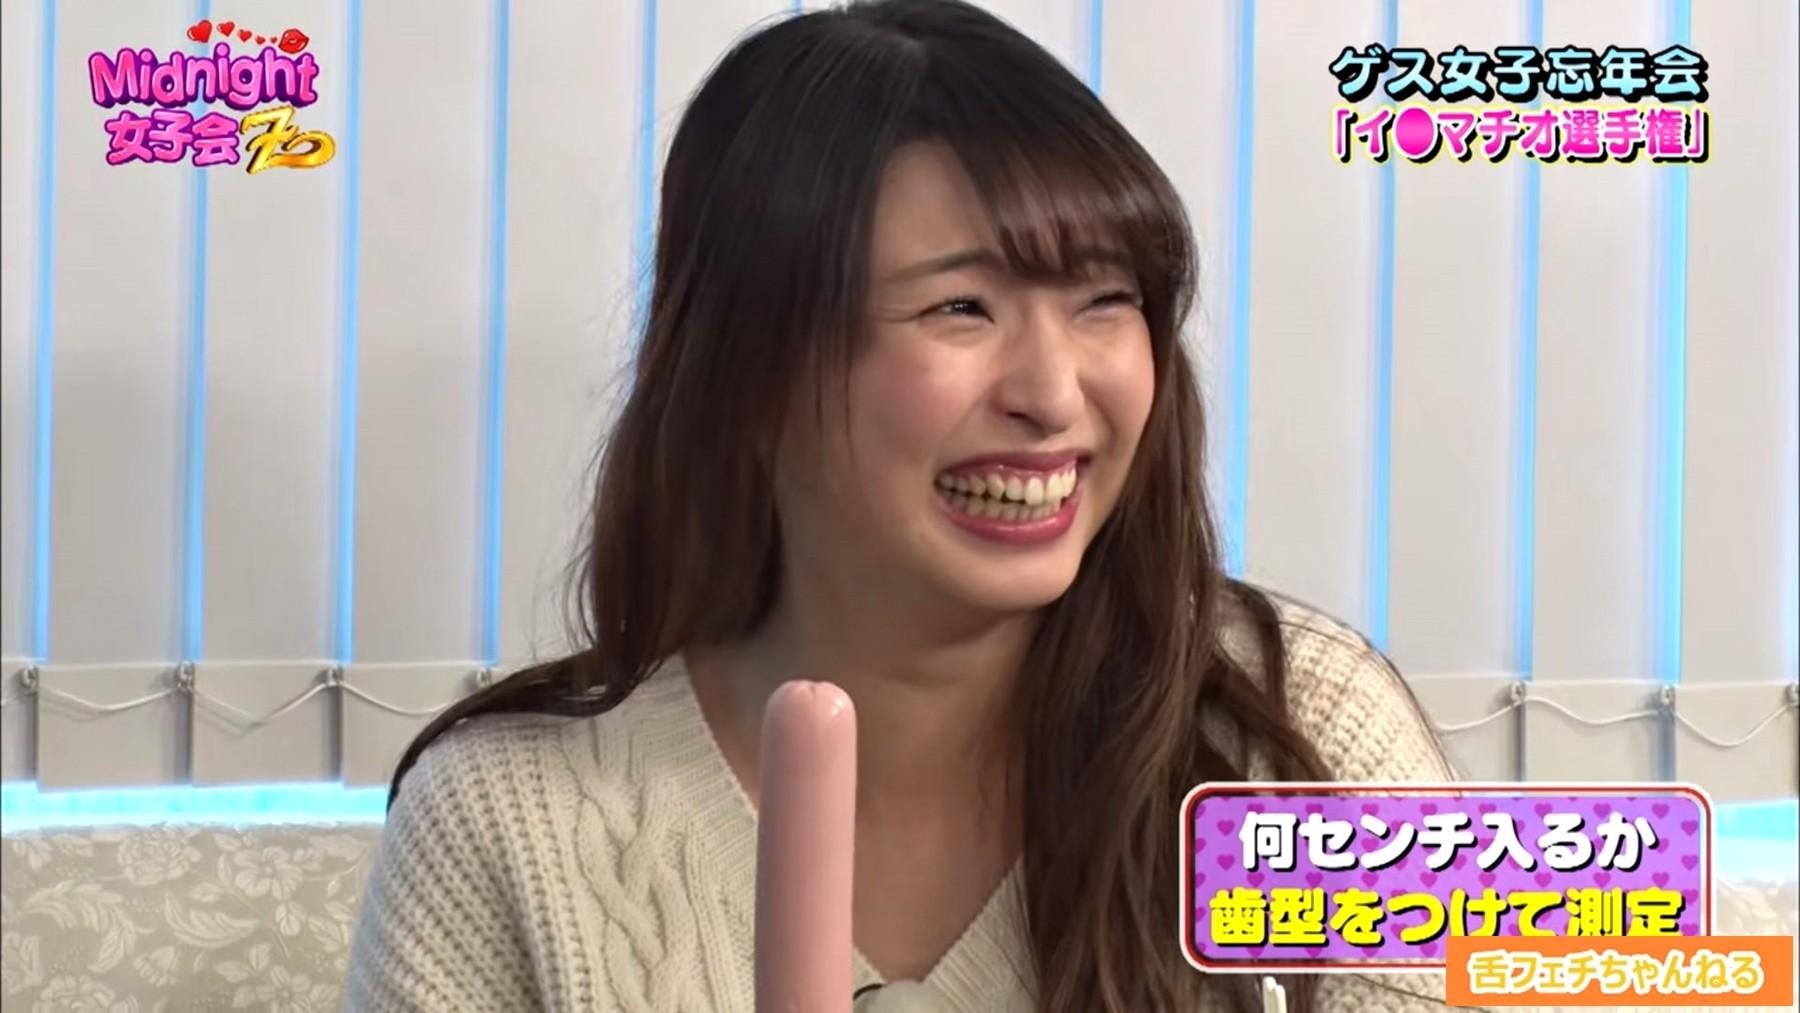 Midnight女子会 イラマチオ選手権 (33)